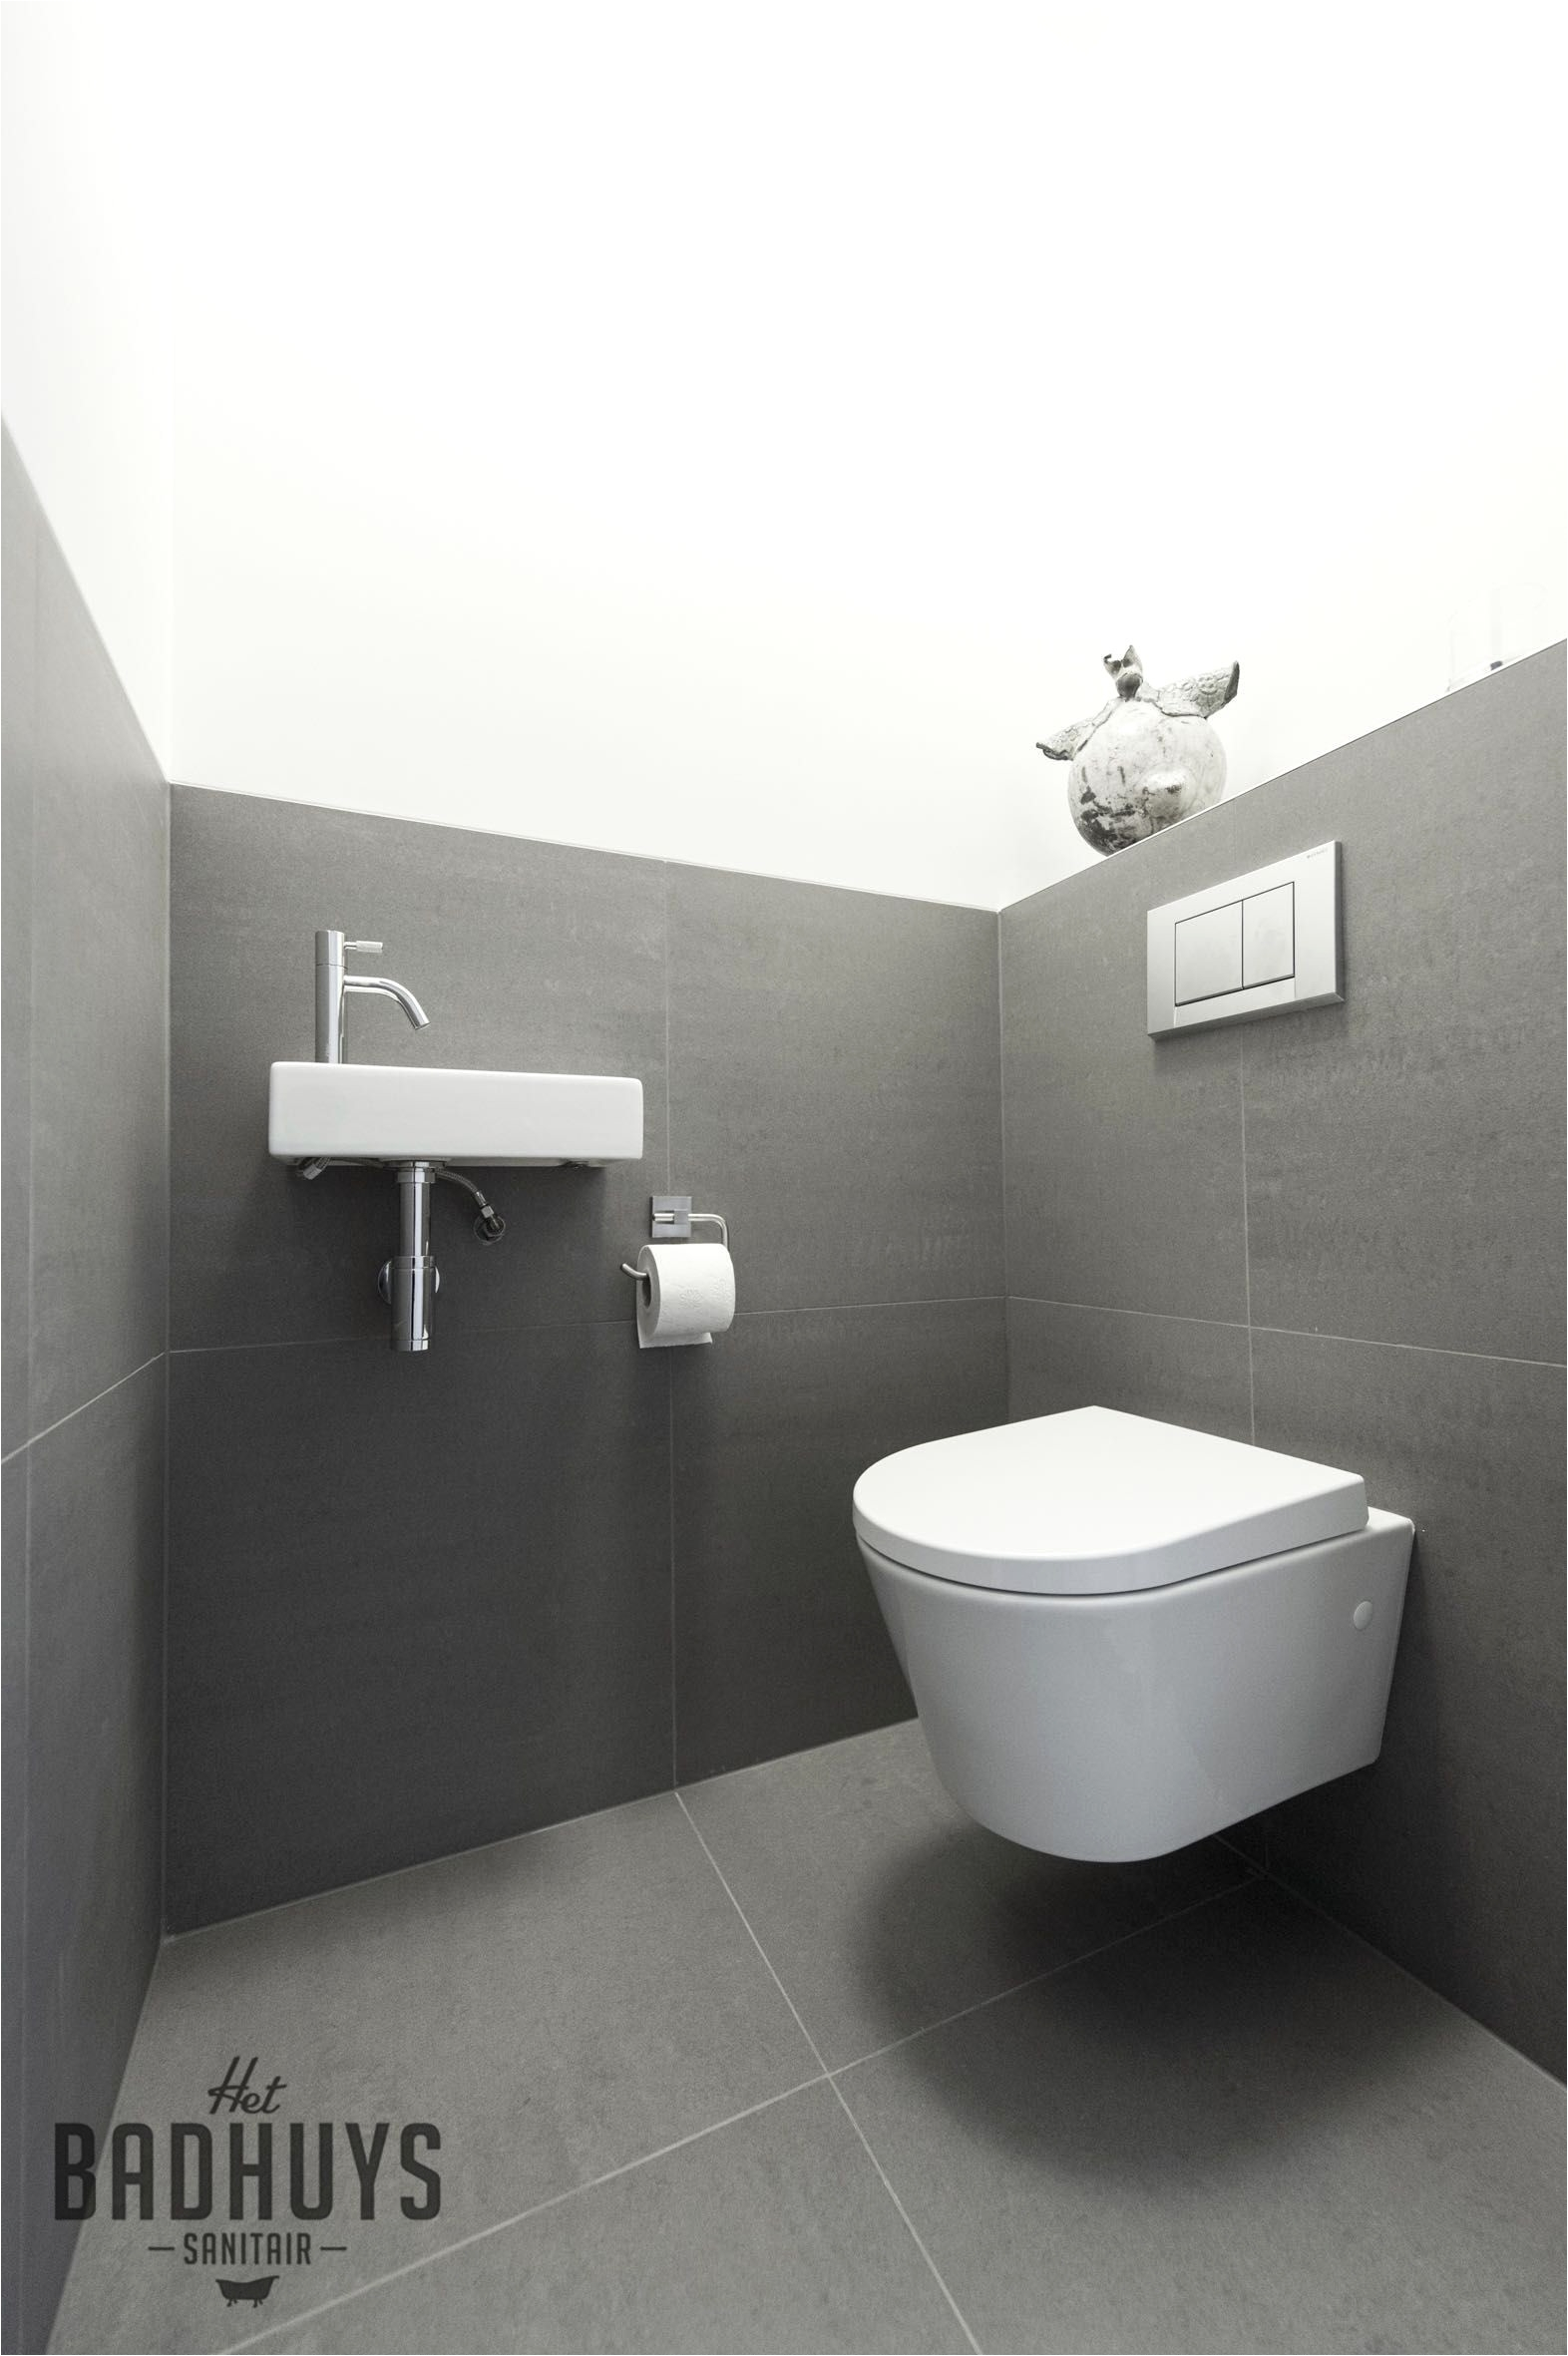 Retro Bathroom Tile Design Ideas Bathroom Tile Design Ideas Bathroom Tile Designs for Small Bathrooms